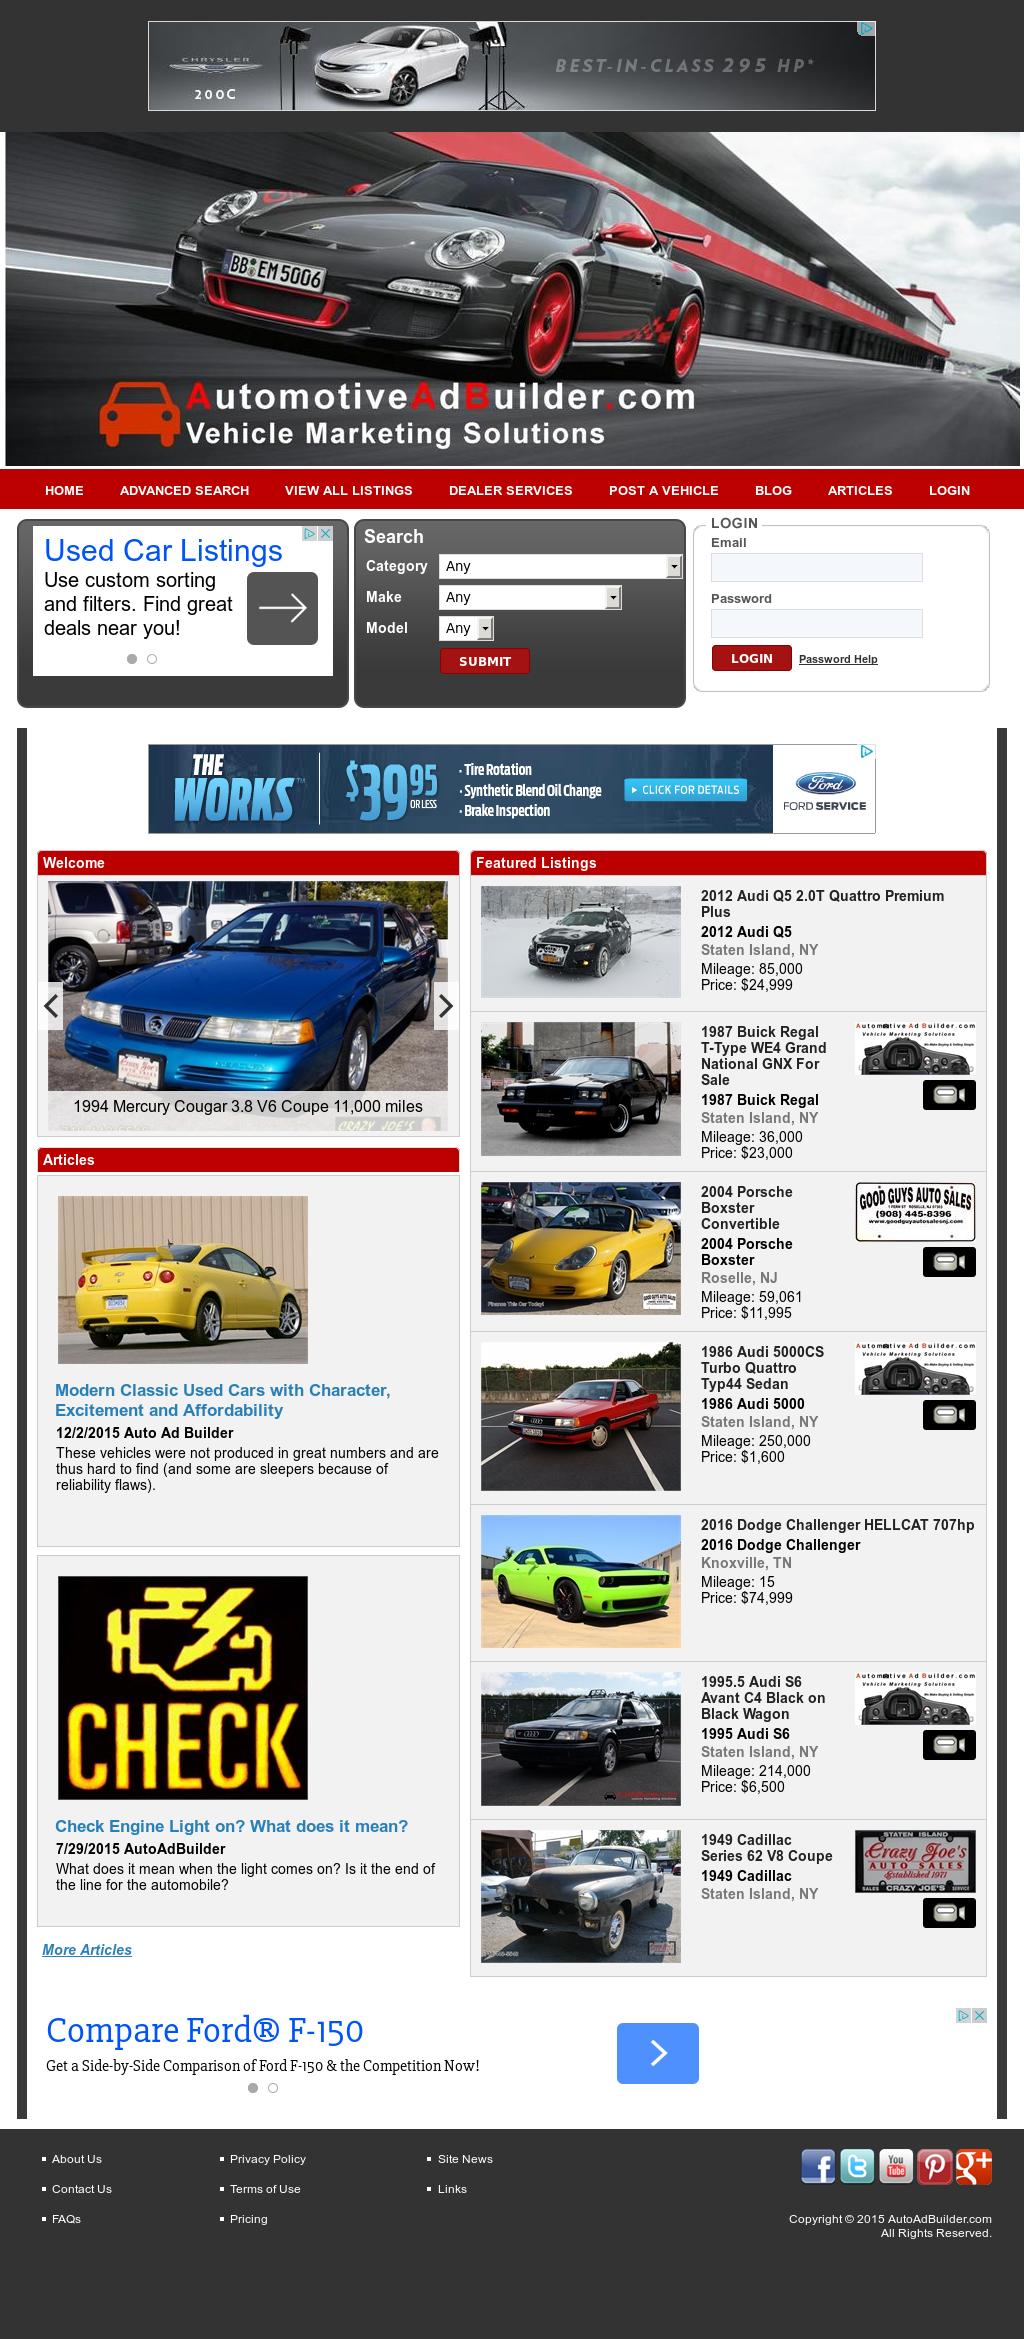 Automotiveadbuilder Competitors, Revenue and Employees